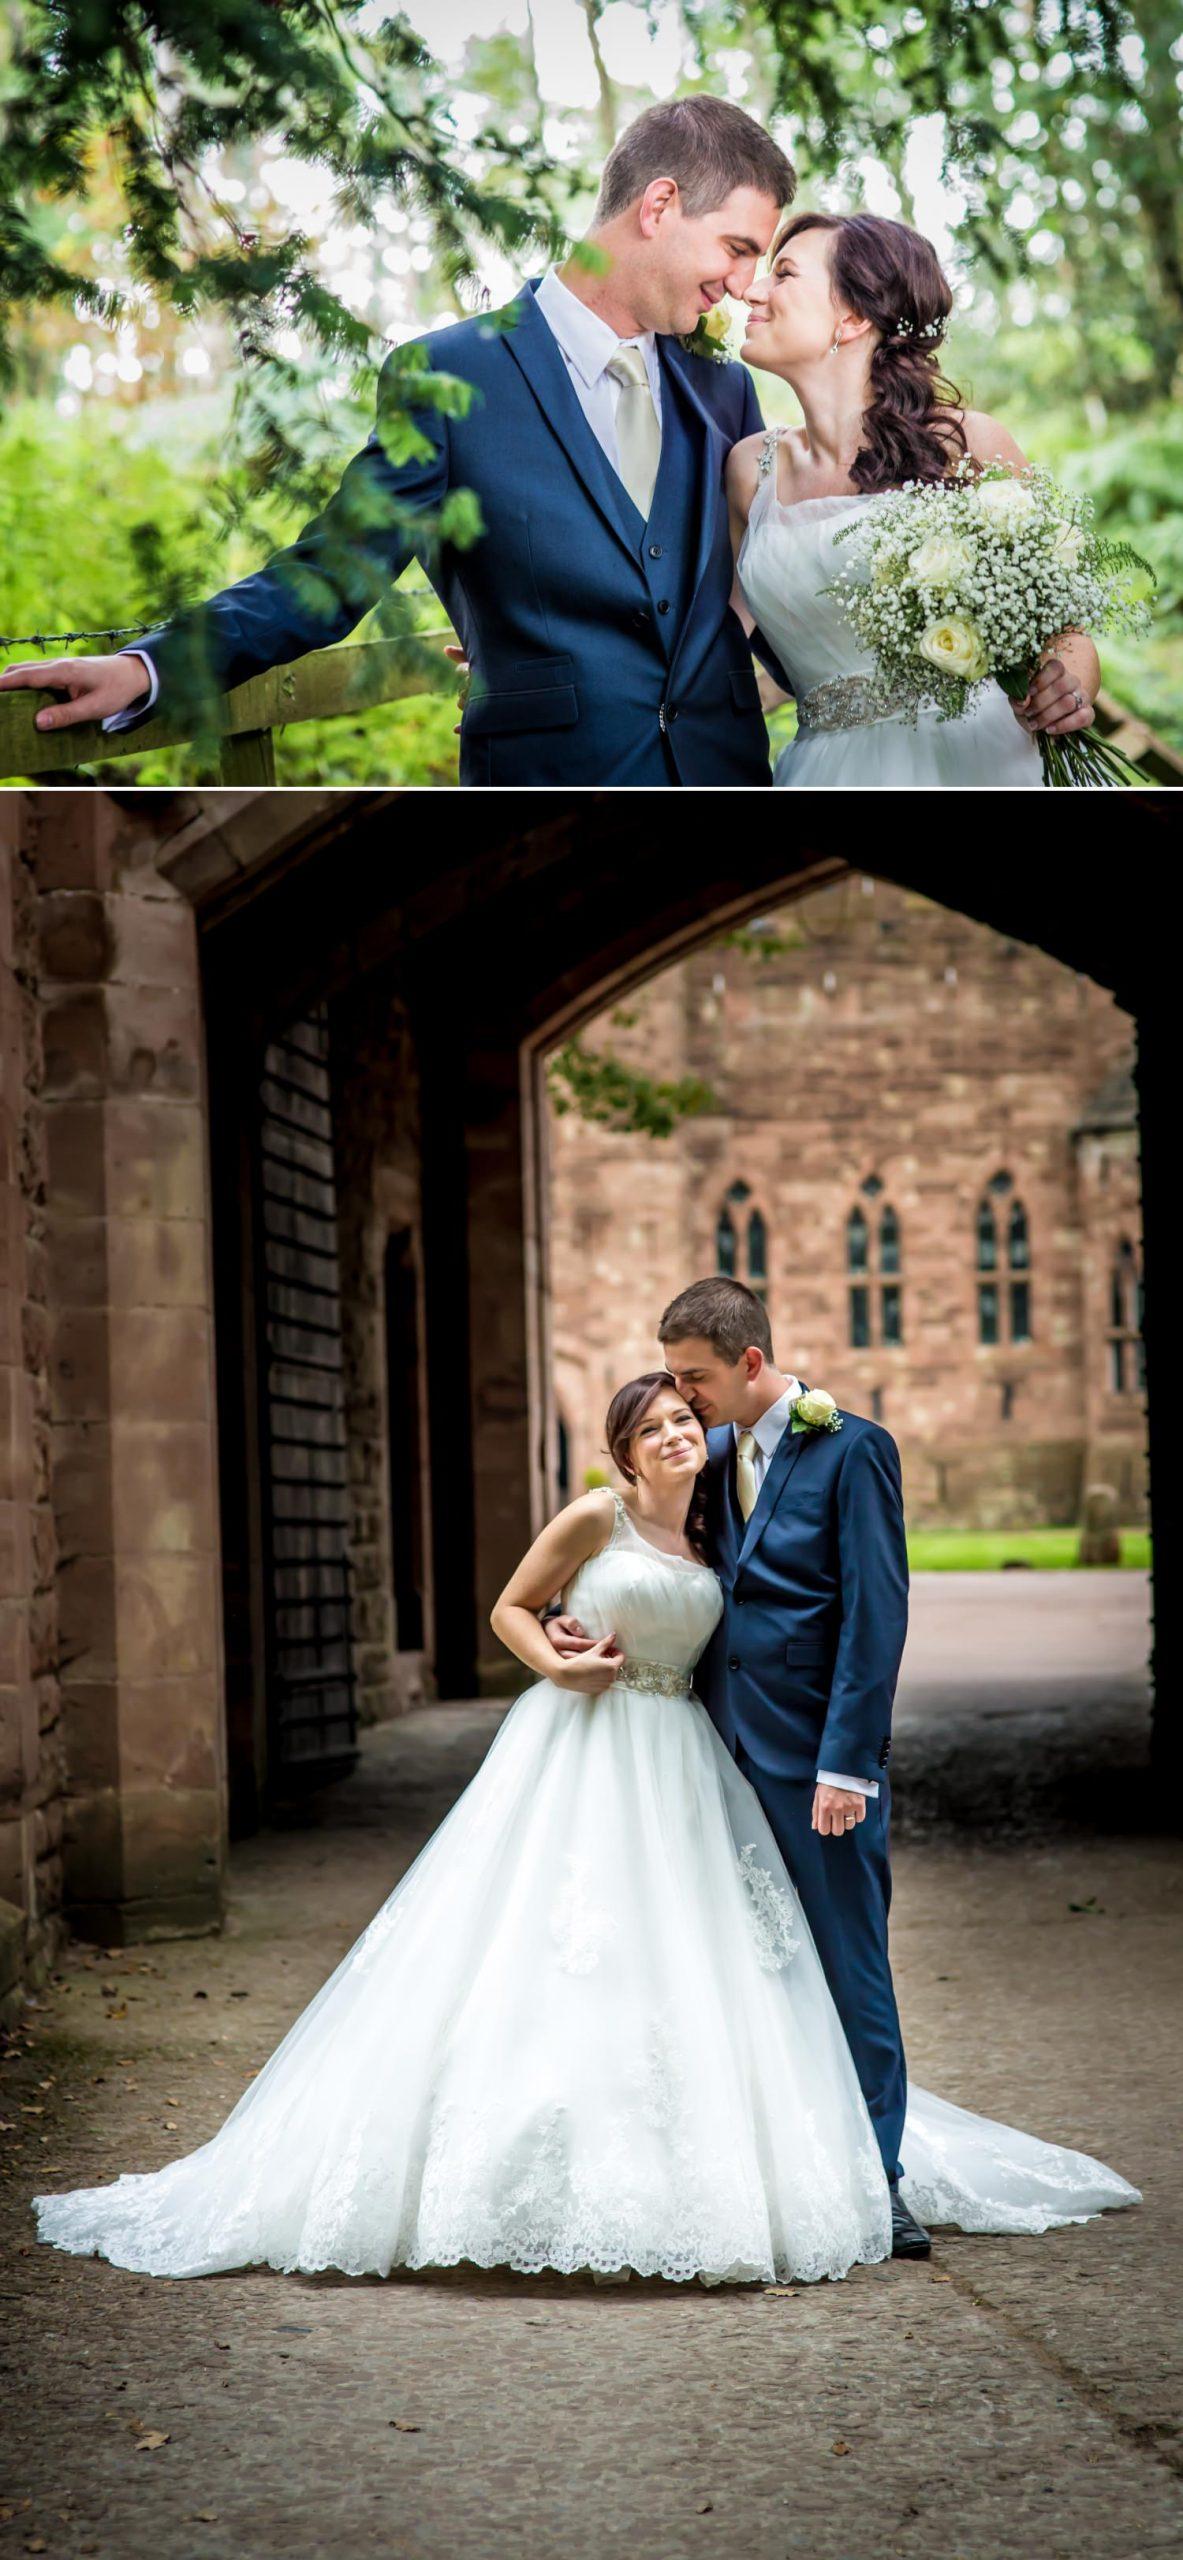 Wedding Photographs at Cheshire wedding venue Peckforton Castle